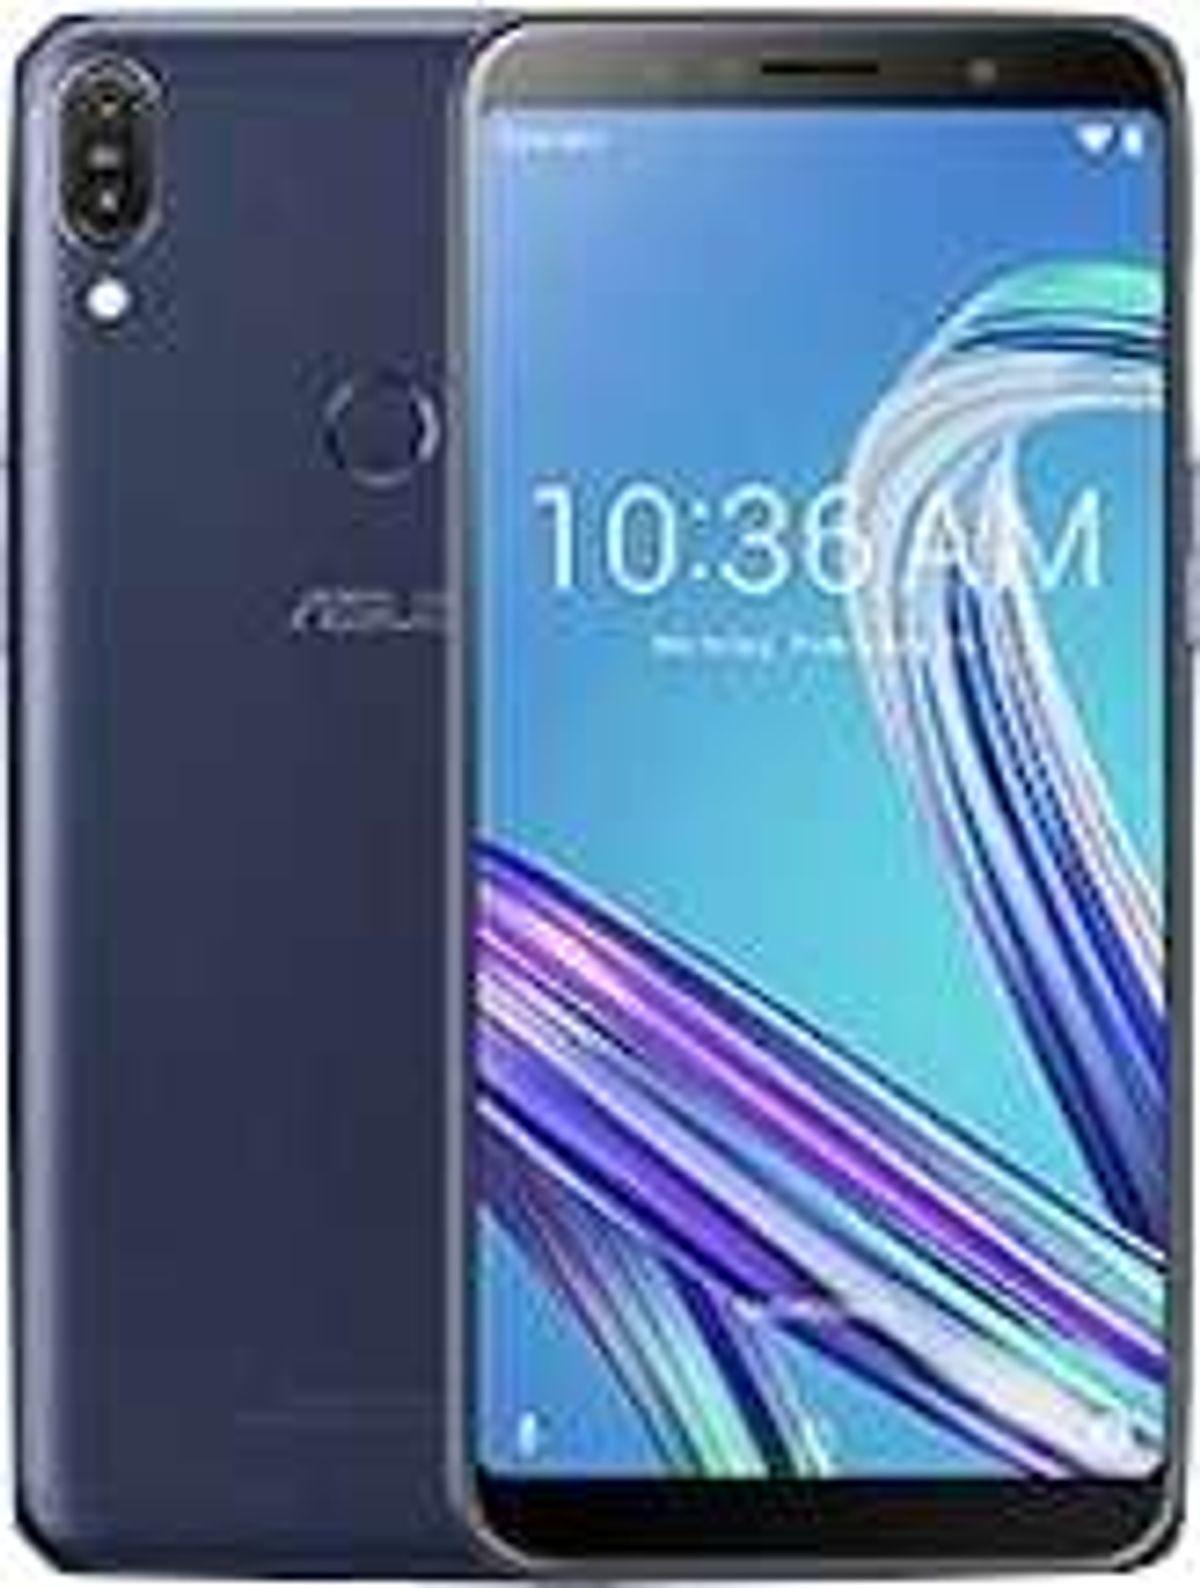 cadc200c081cd8 Best Phones Under 10000 in India July 2019   Digit.in